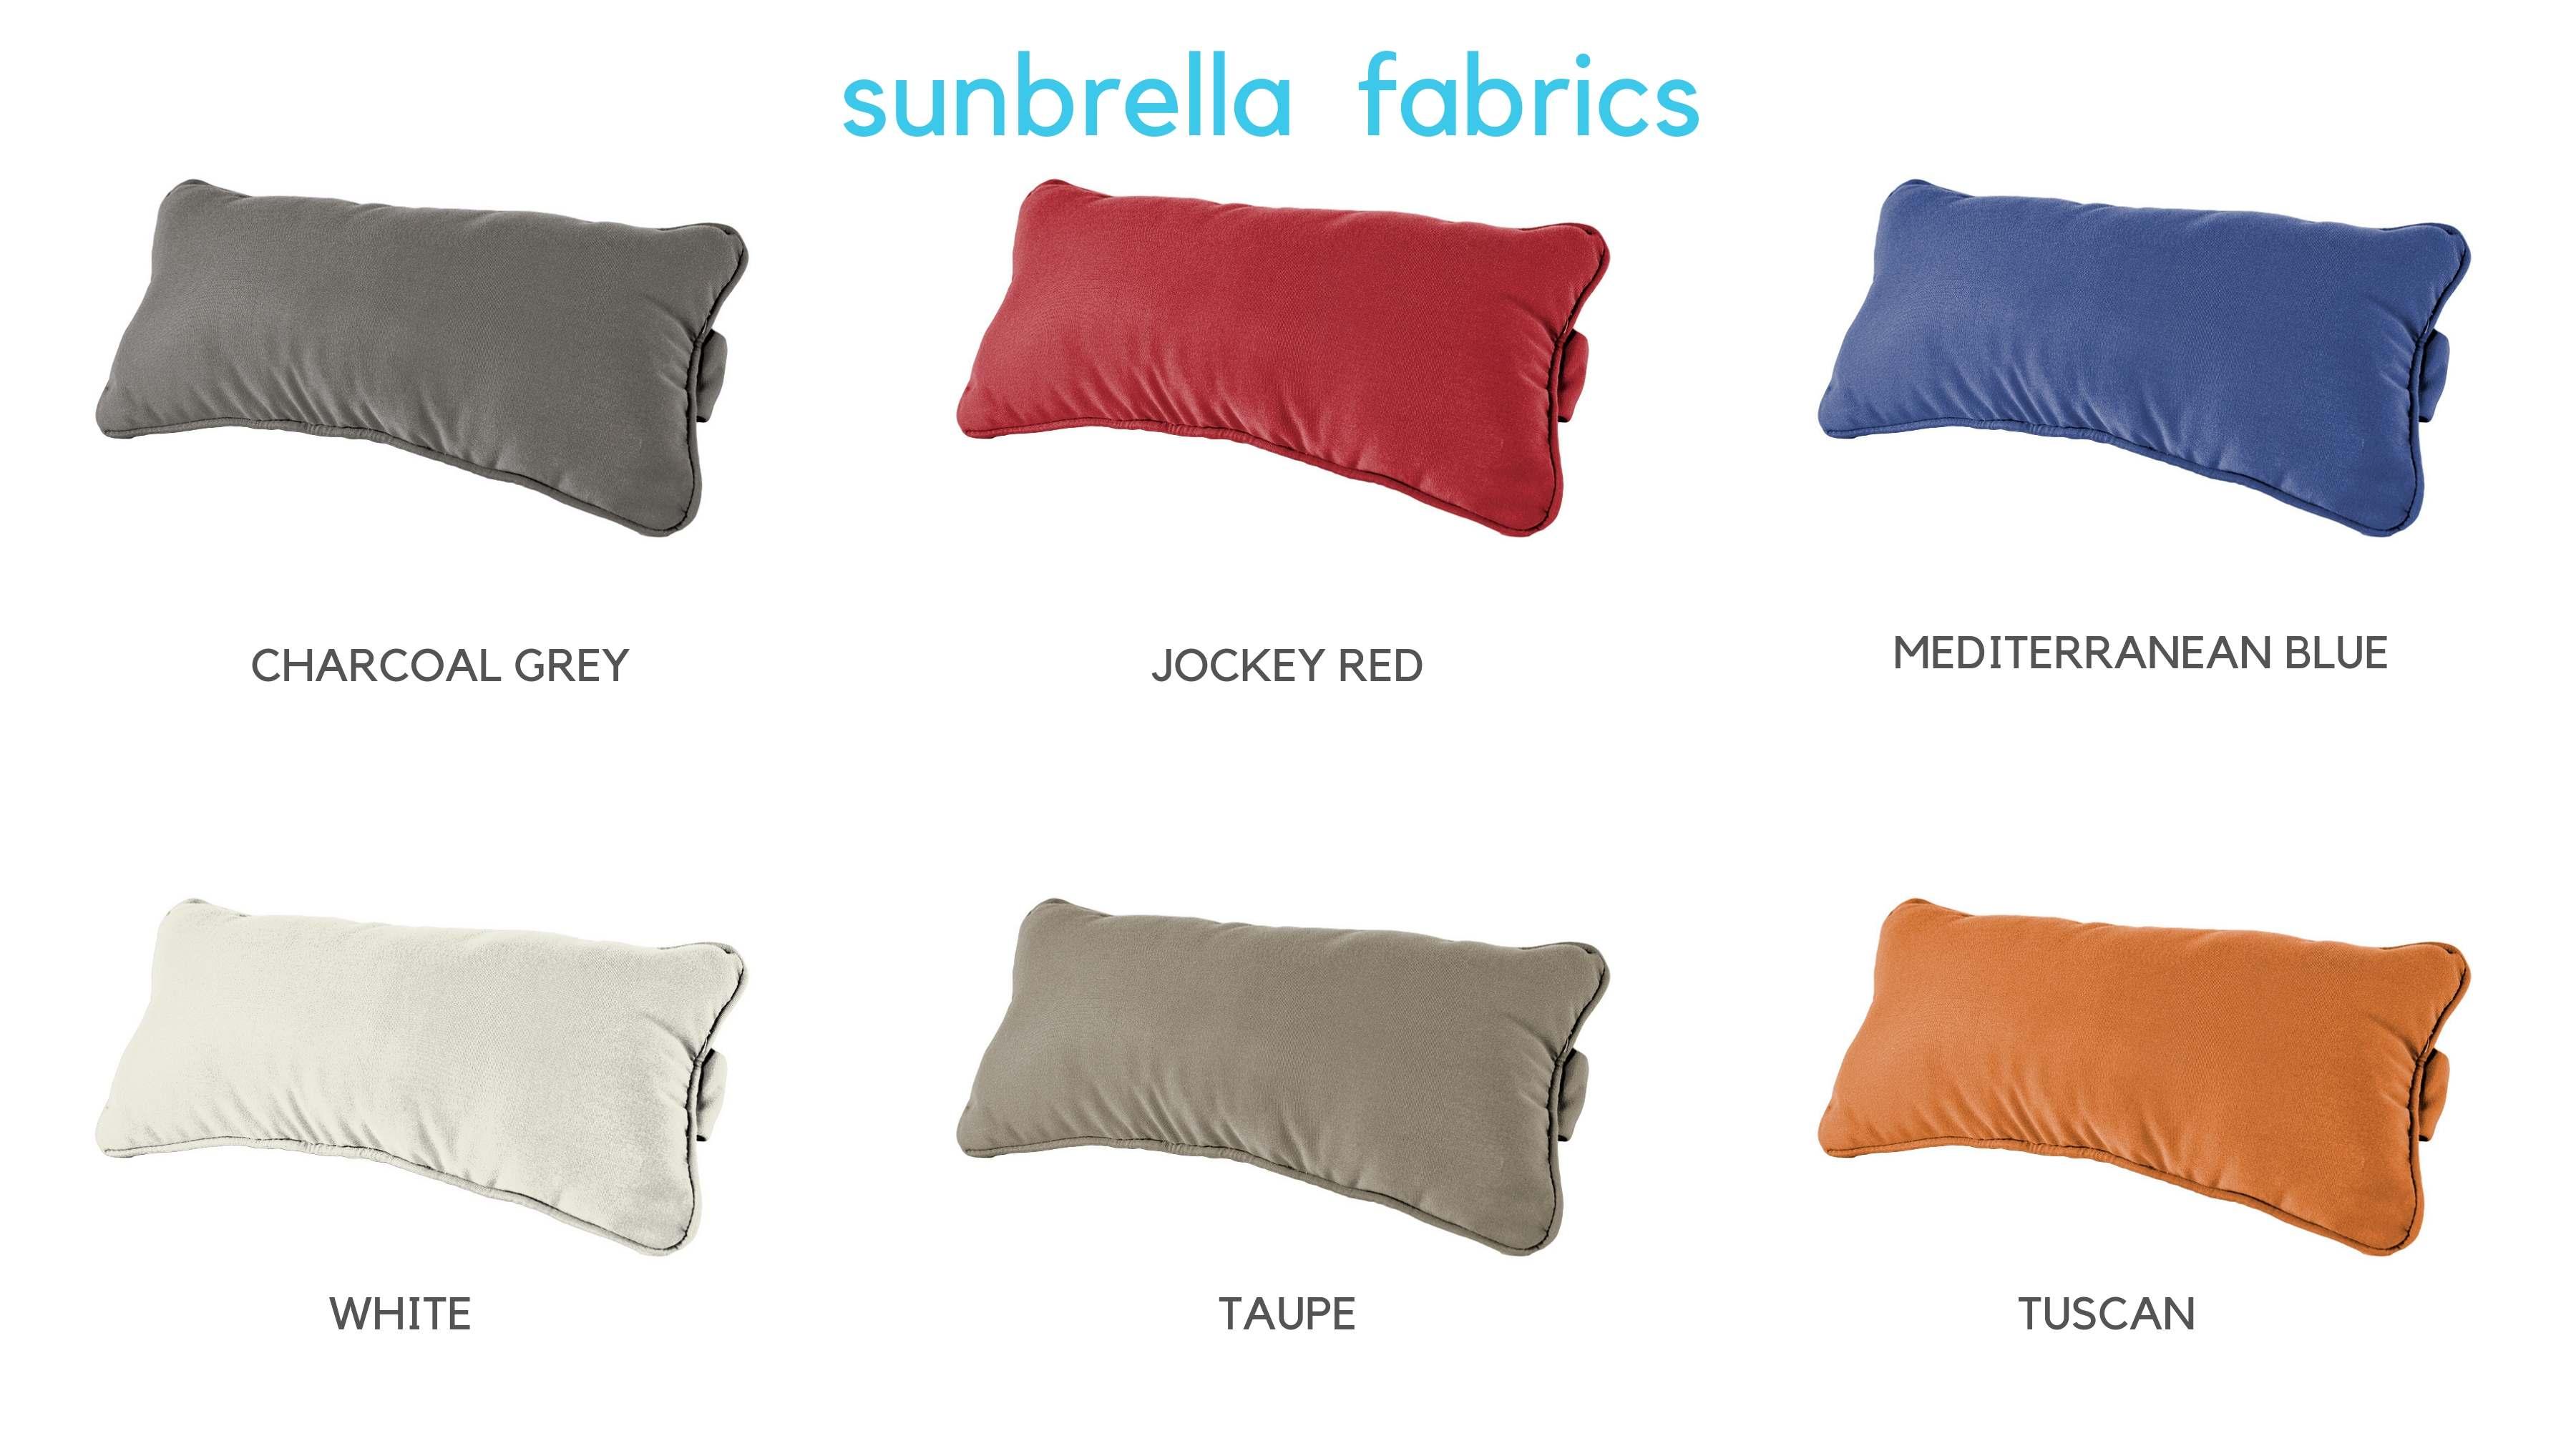 Ledge Lounger sunbrella fabric options for headrest